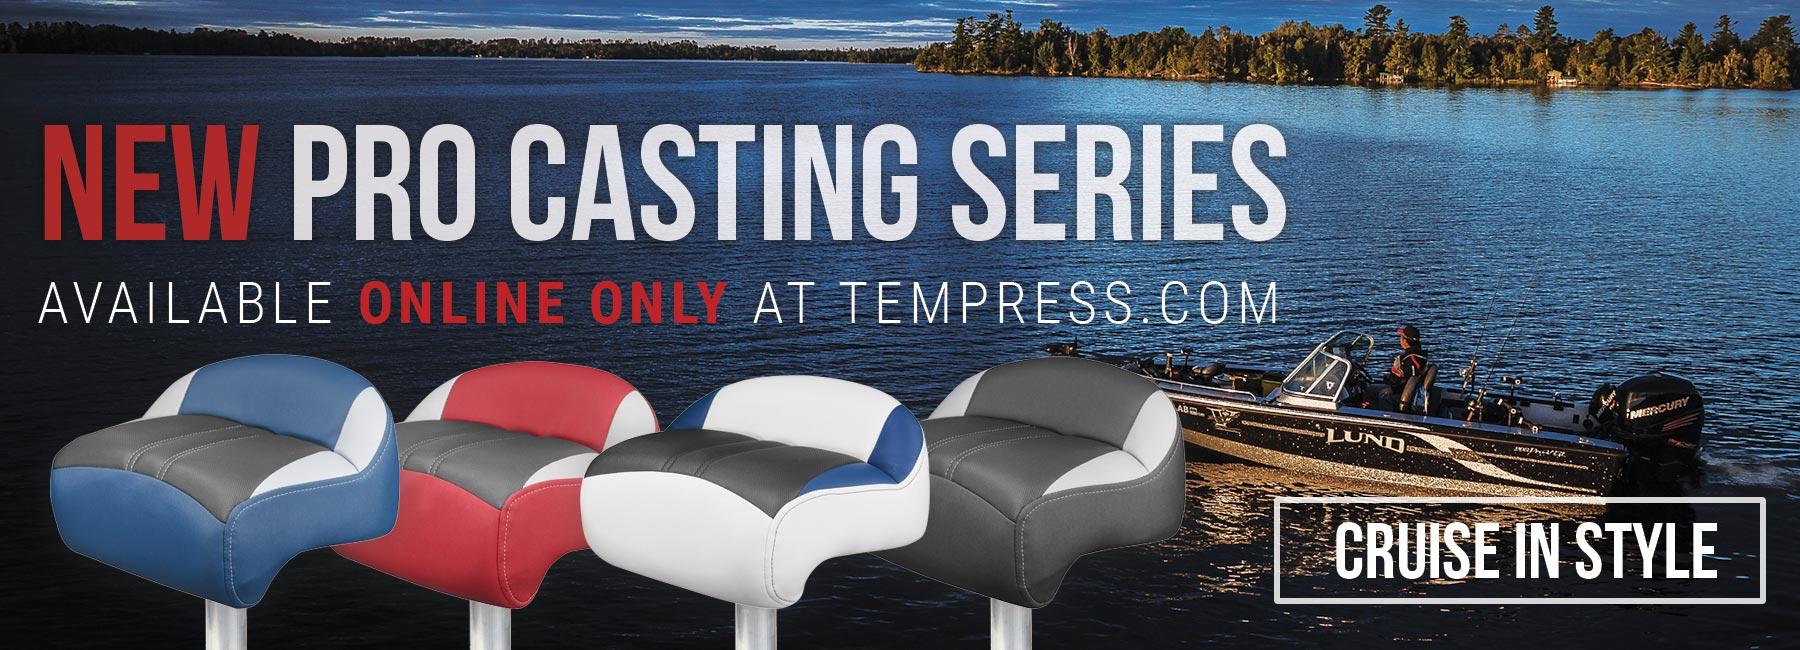 Pro Casting Series